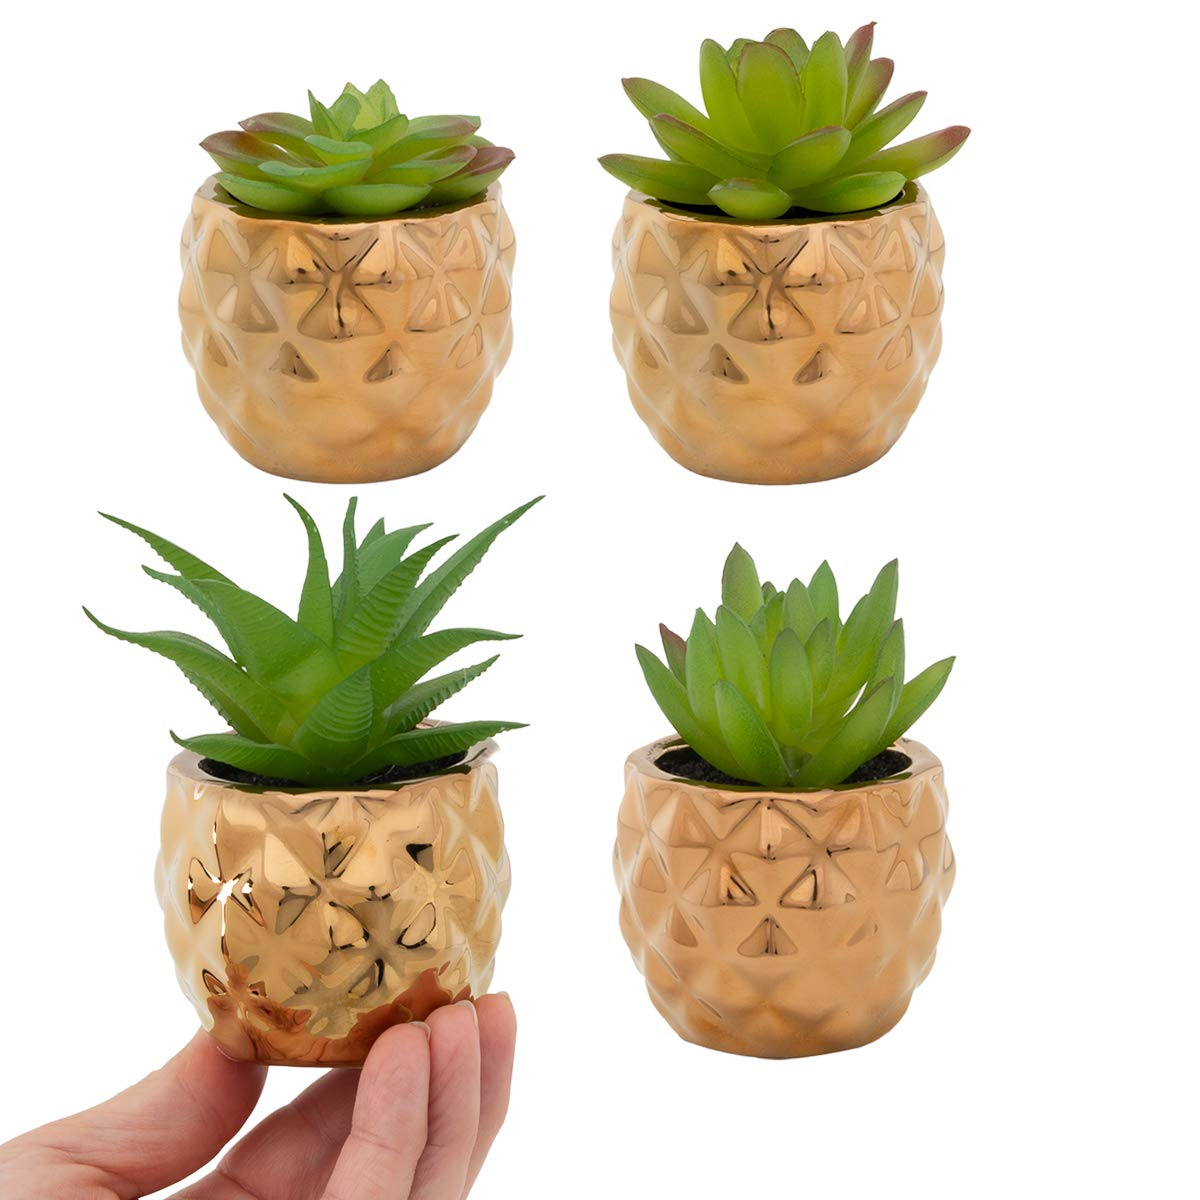 Home Trends フェイク多肉植物4個セット 金鉢 人工植物 ホームインテリア オフィス装飾 B07HCPCWZ8